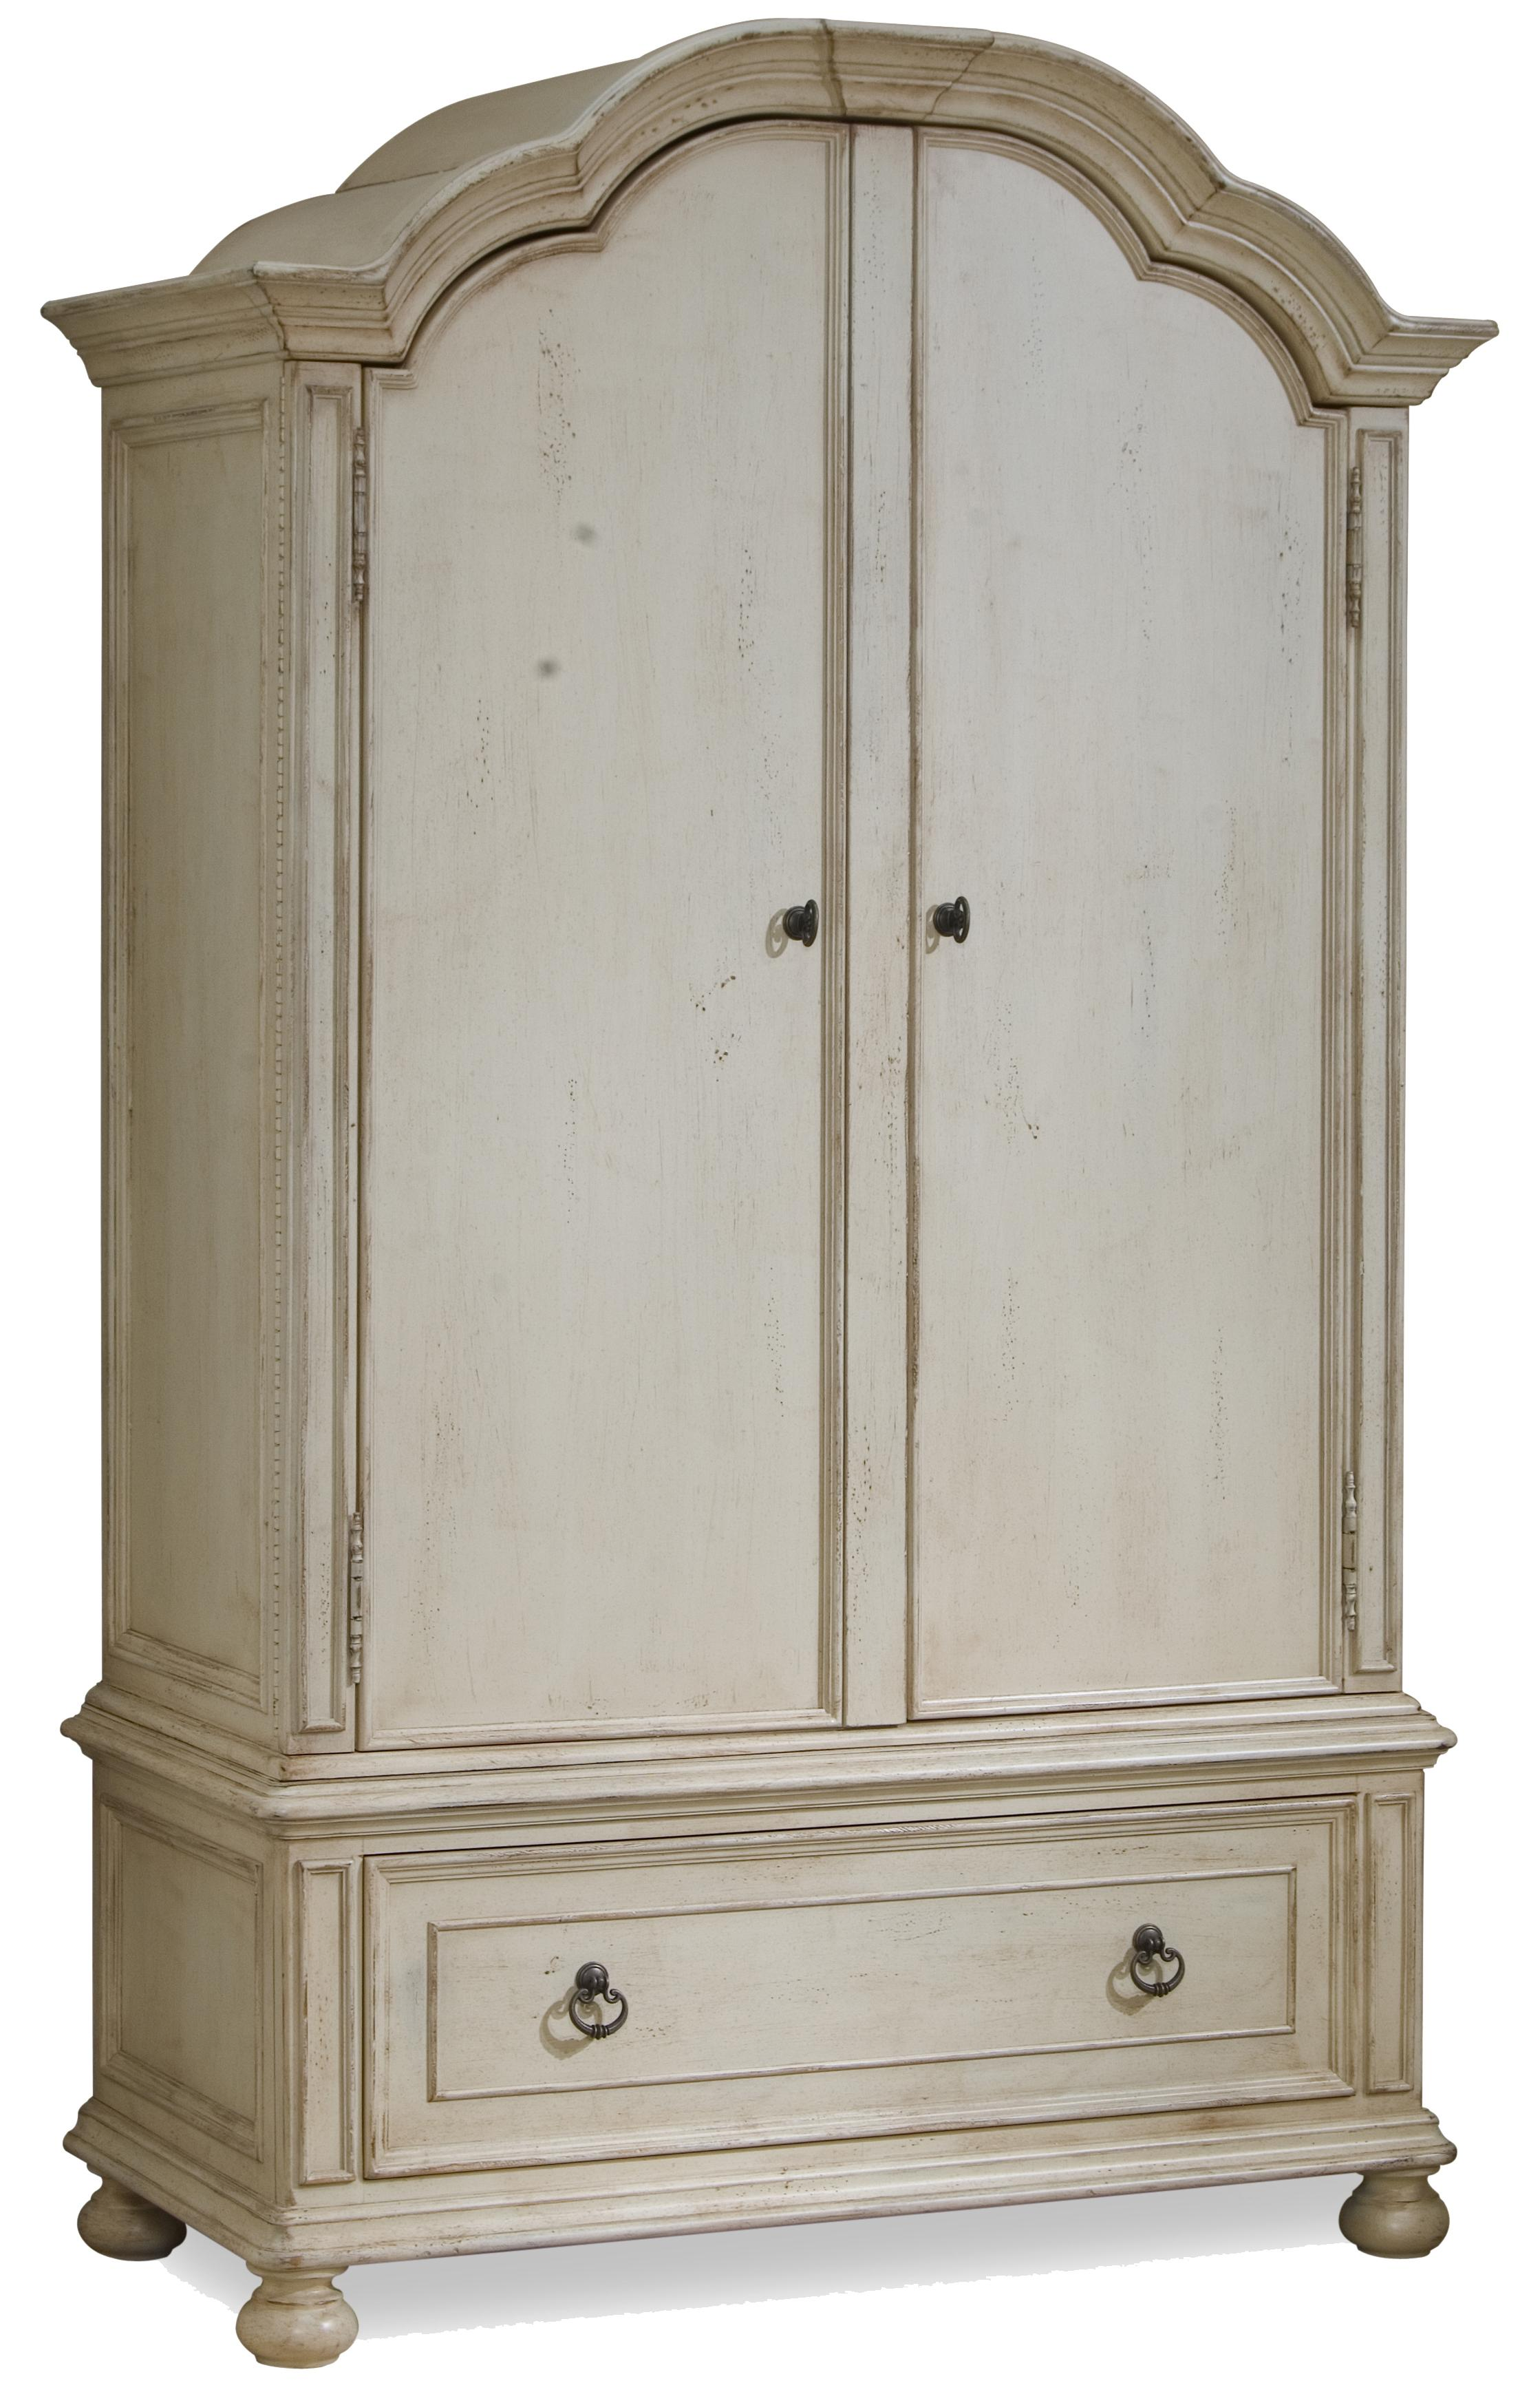 Belfort Signature Sonnet Wardrobe - Item Number: 76161-62